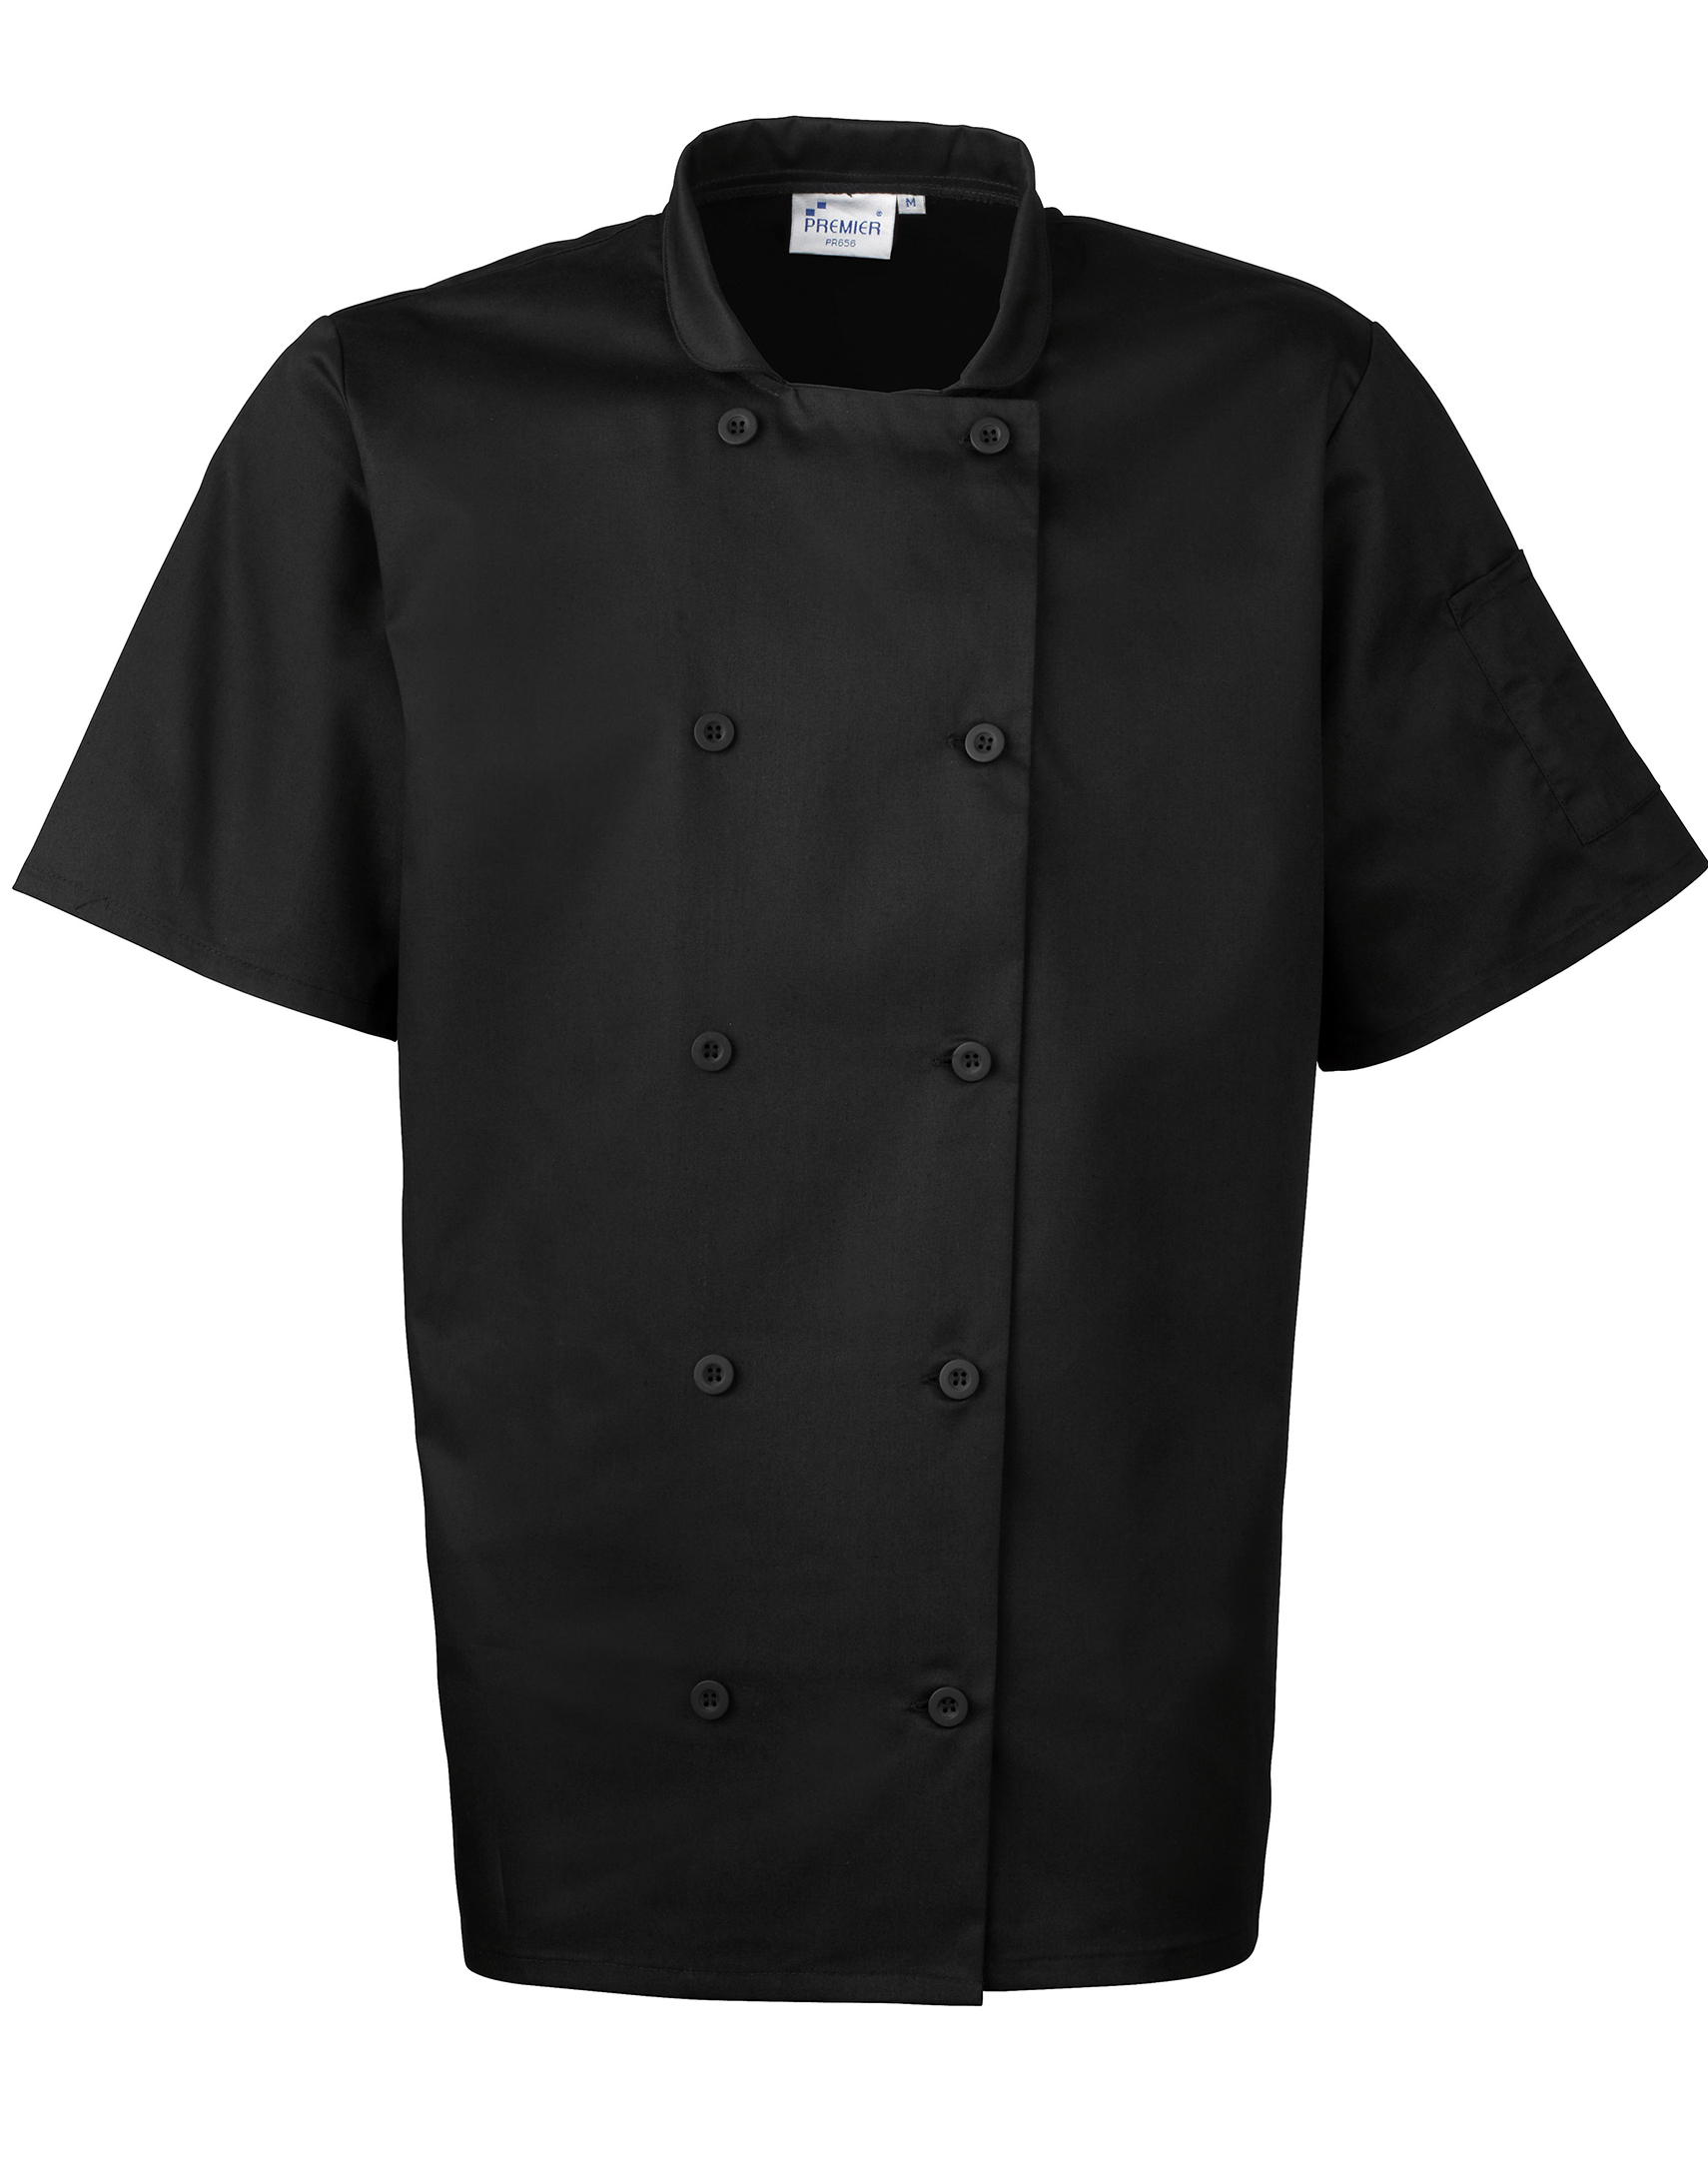 Premier - Short Sleeve Chef´s Jacket